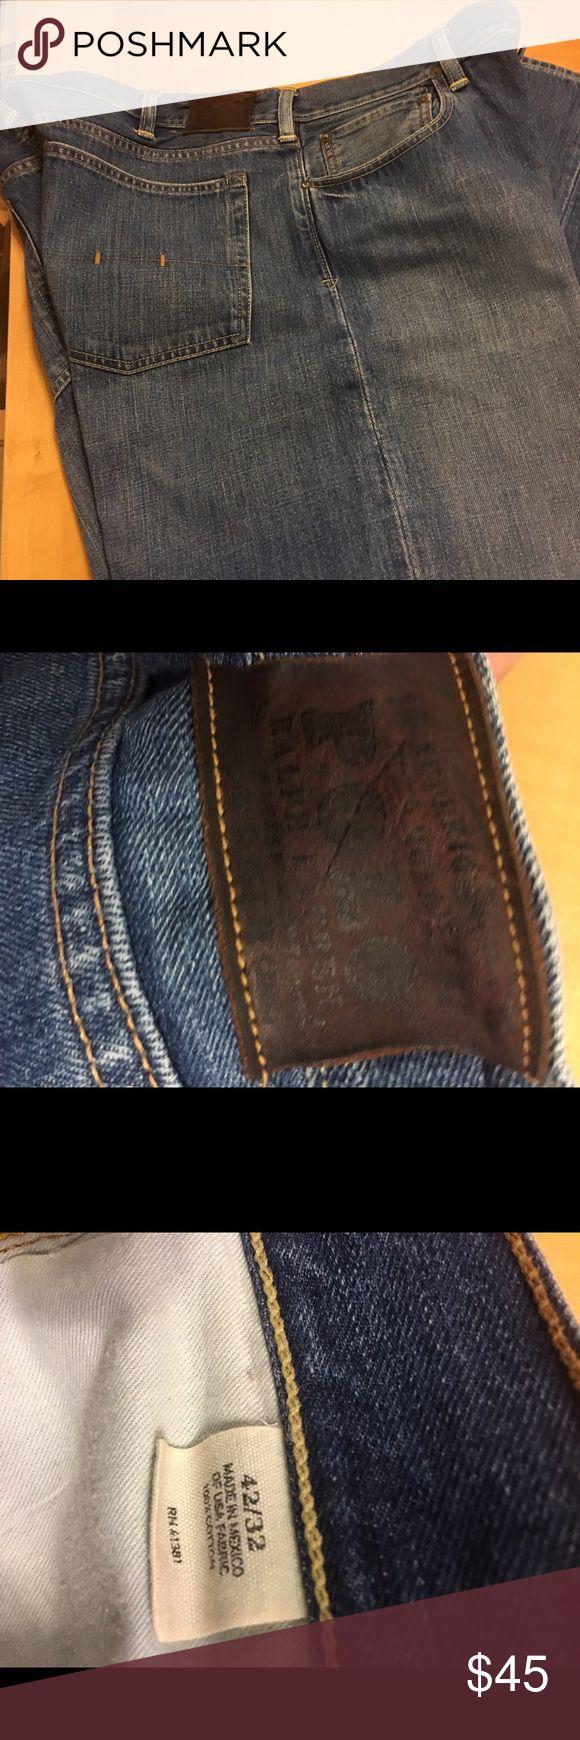 Men's Ralph Lauren Jeans 42/32 Brand new but no tags. Never worn 42x32 men's jeans. Ralph Lauren Polo boot cut. Polo by Ralph Lauren Jeans Boot Cut